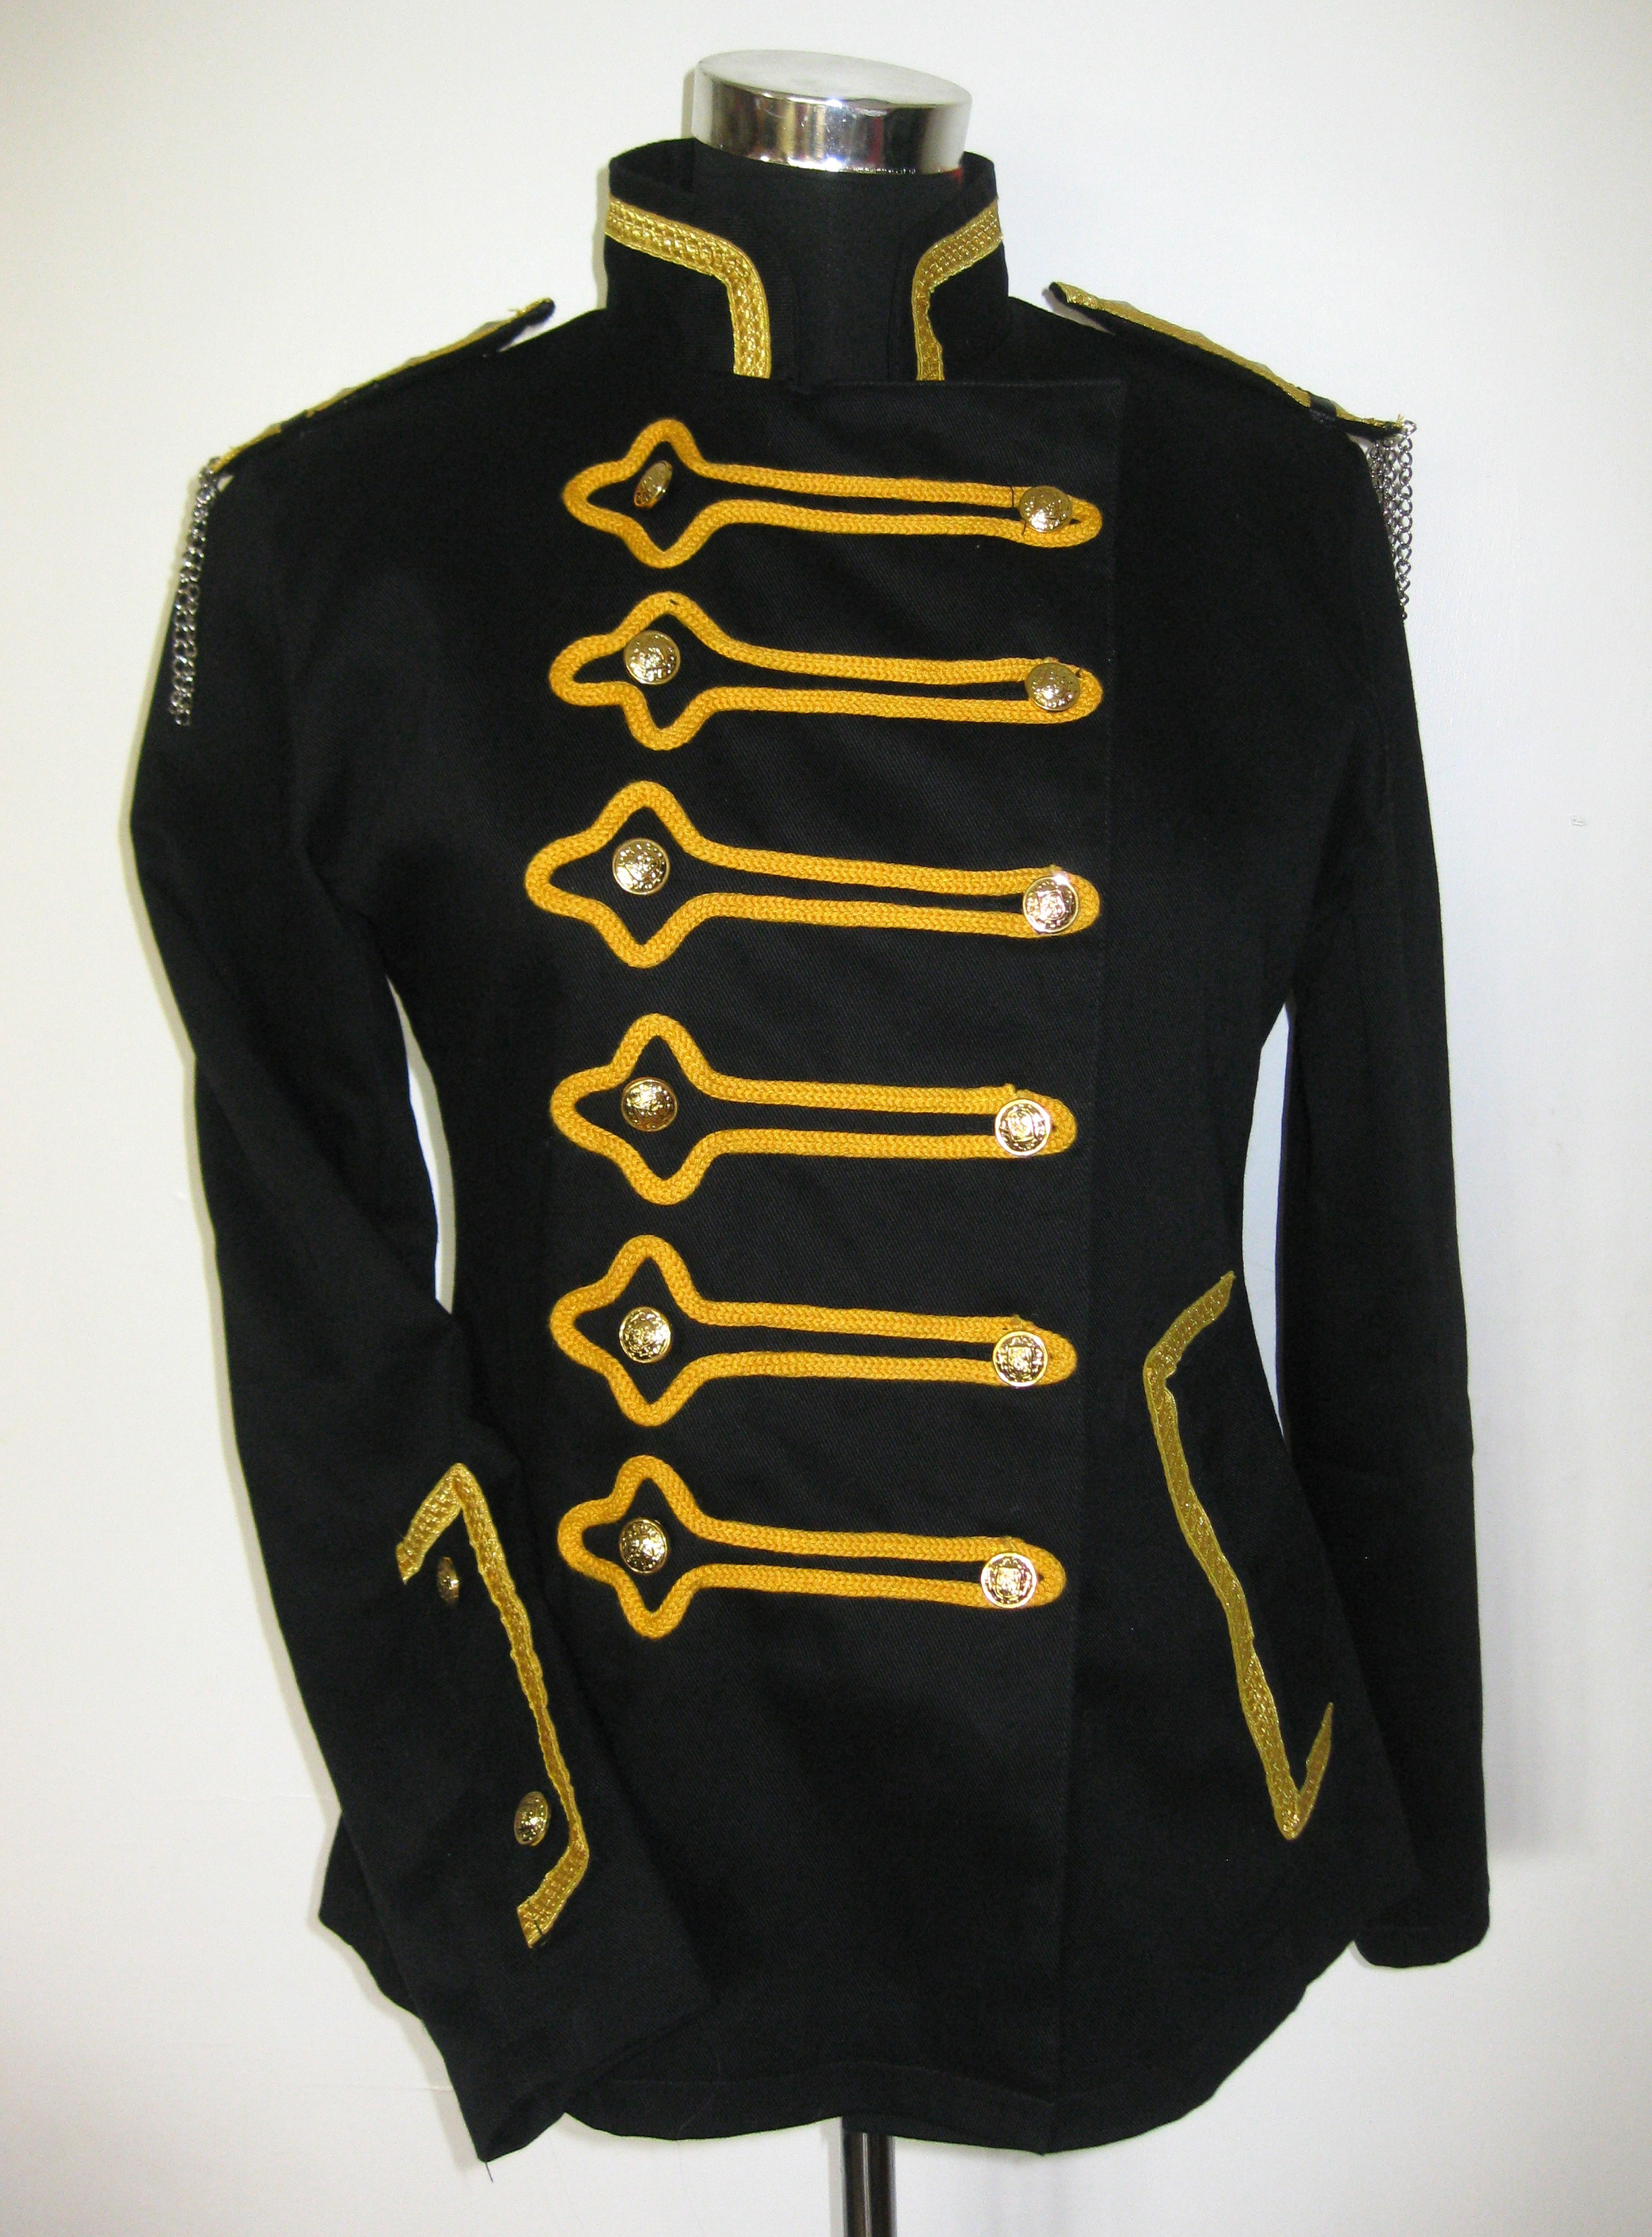 kendall_military_band_style_jacket_jackets_5.JPG